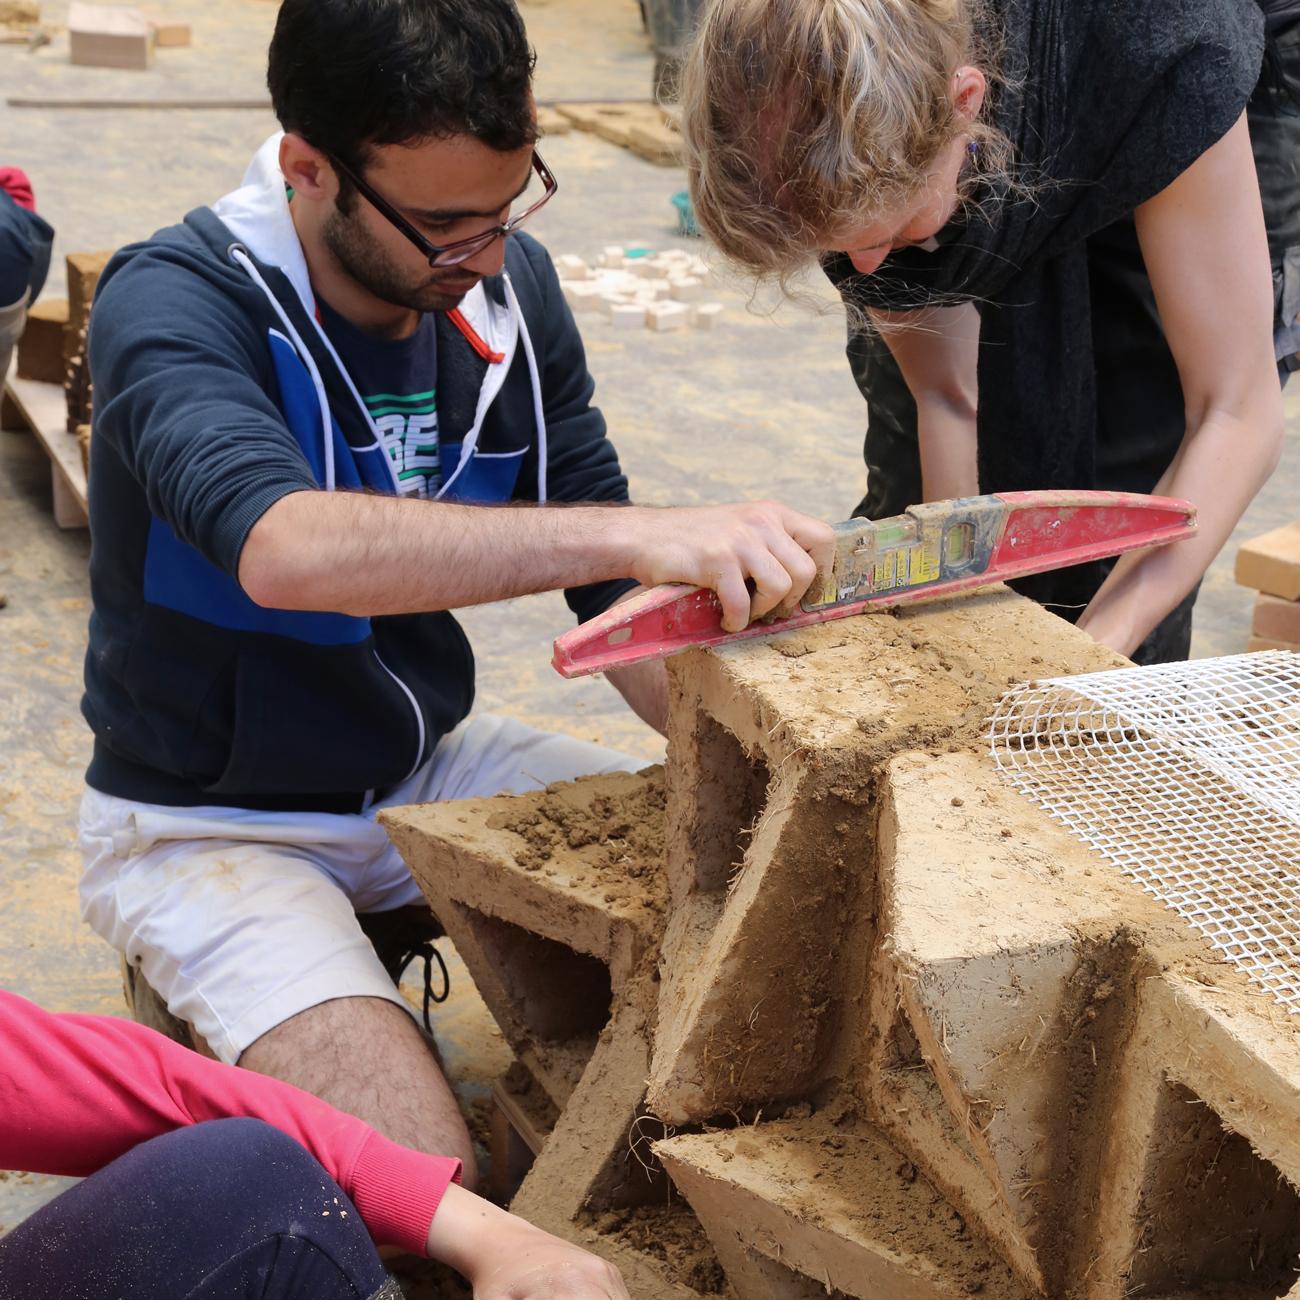 Développer un esprit de recherche de matériaux en terre crue - briques de terre crue - adobes - amàco